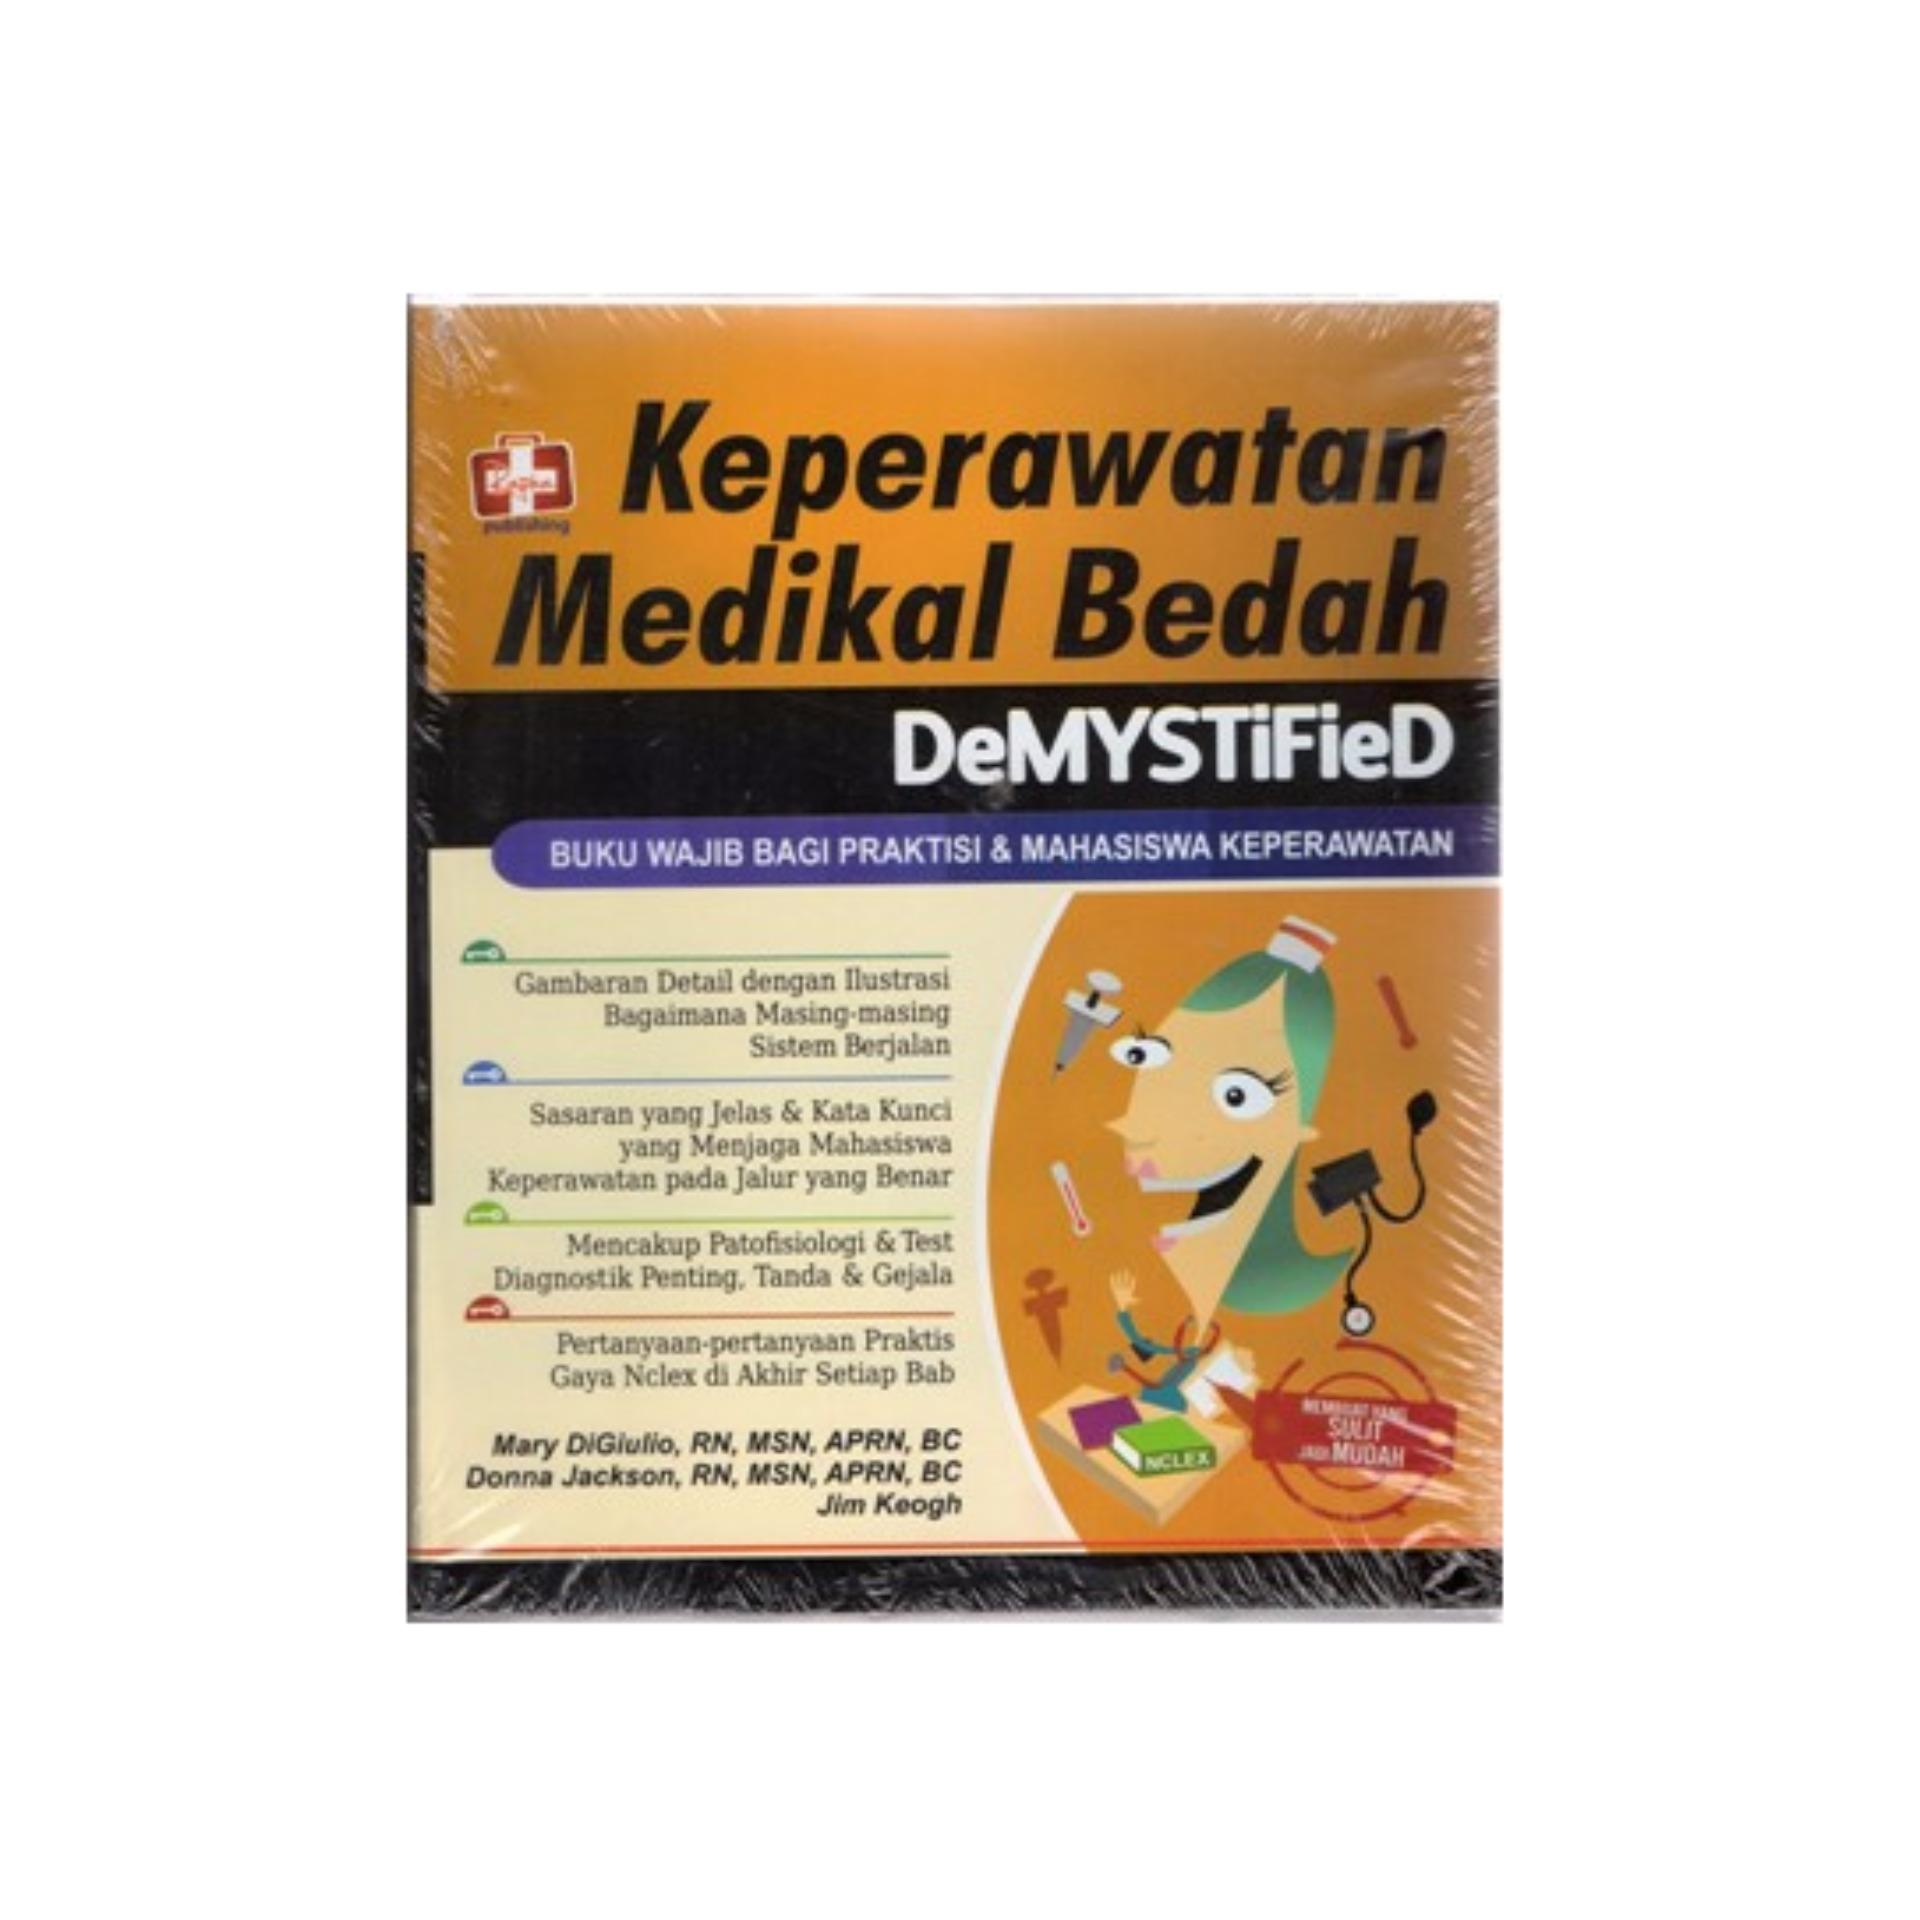 KEPERAWATAN MEDIKAL BEDAH DEMYSTIFIED, BUKU WAJIB BAGI PARA PRAKTISI DAN MAHASISWA KEPERAWATAN, Mary DiGiulio,dkk